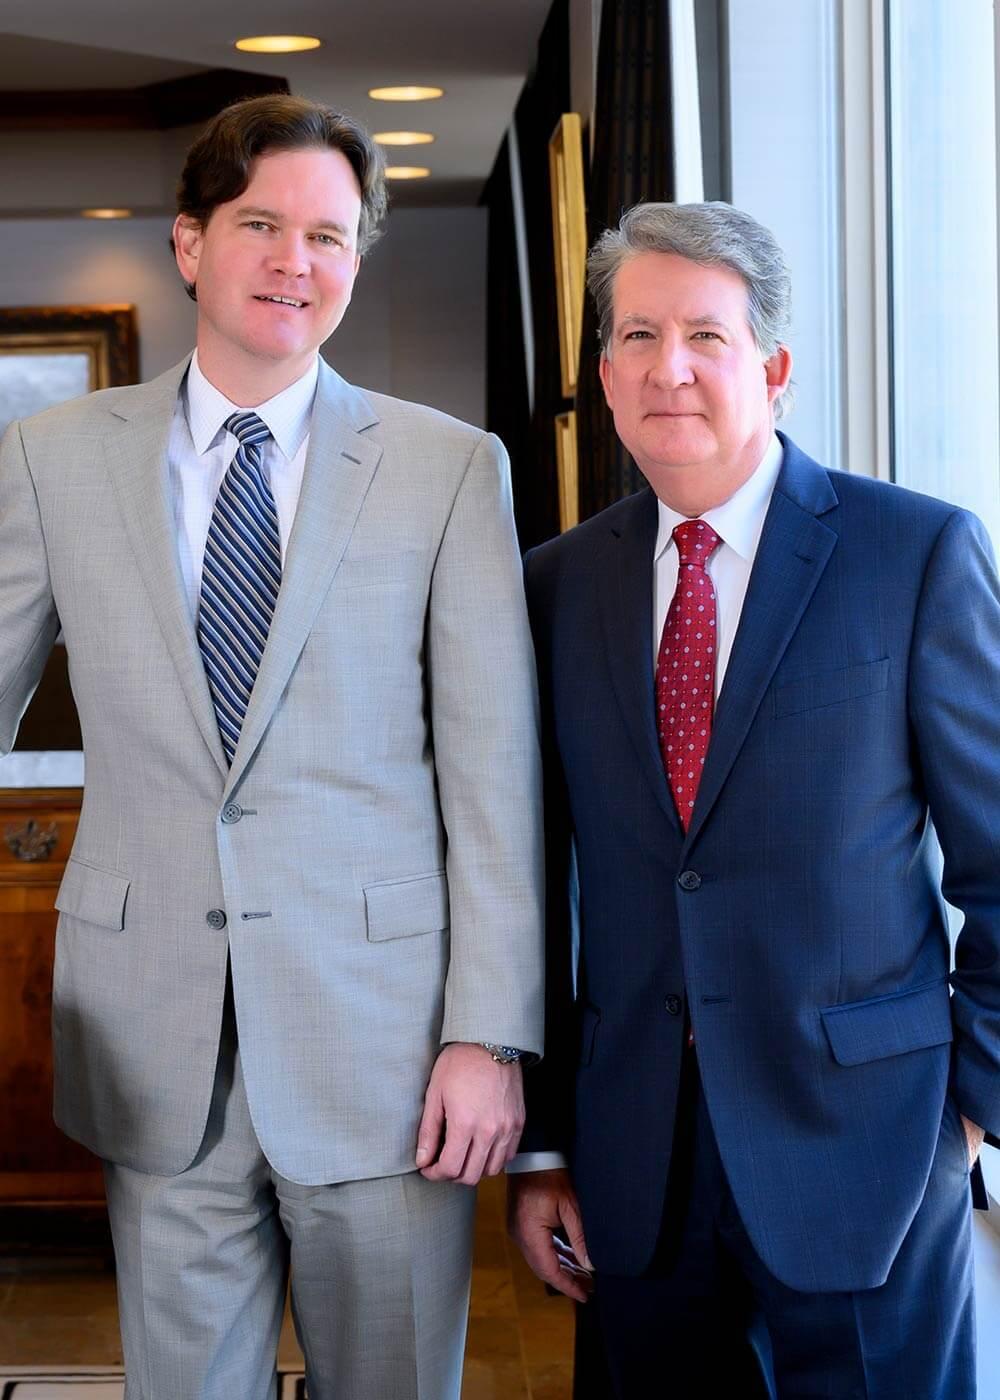 James R. Moncus III and Michael D. Ermert